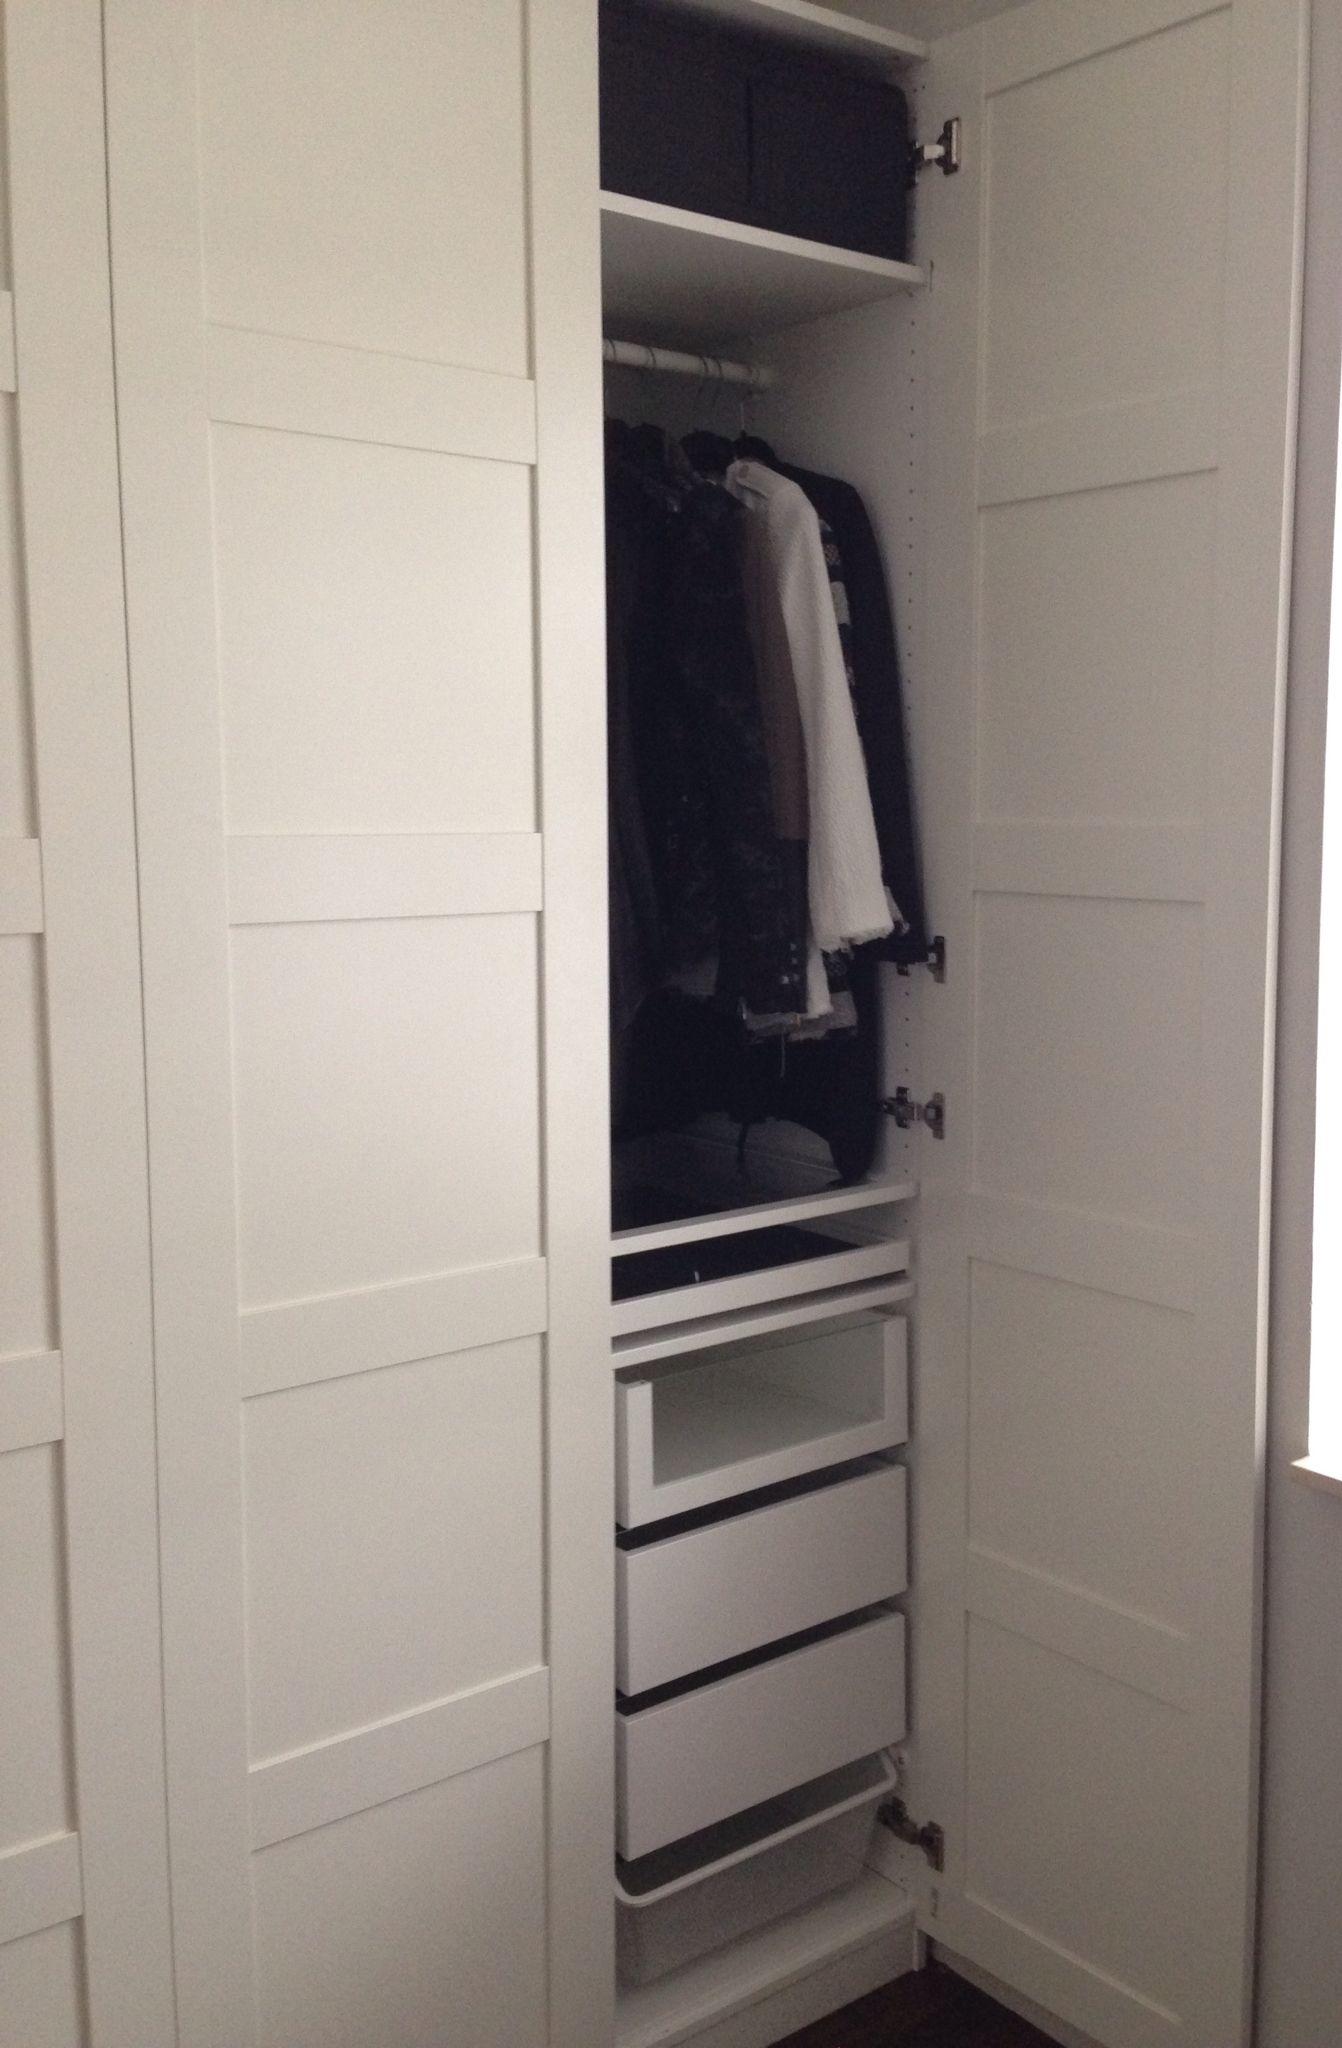 Ikea Garderobekast Pax Bergsbo.Pax Wardrobe Ikea Bergsbo Doors B E D R O O M Slaapkamer